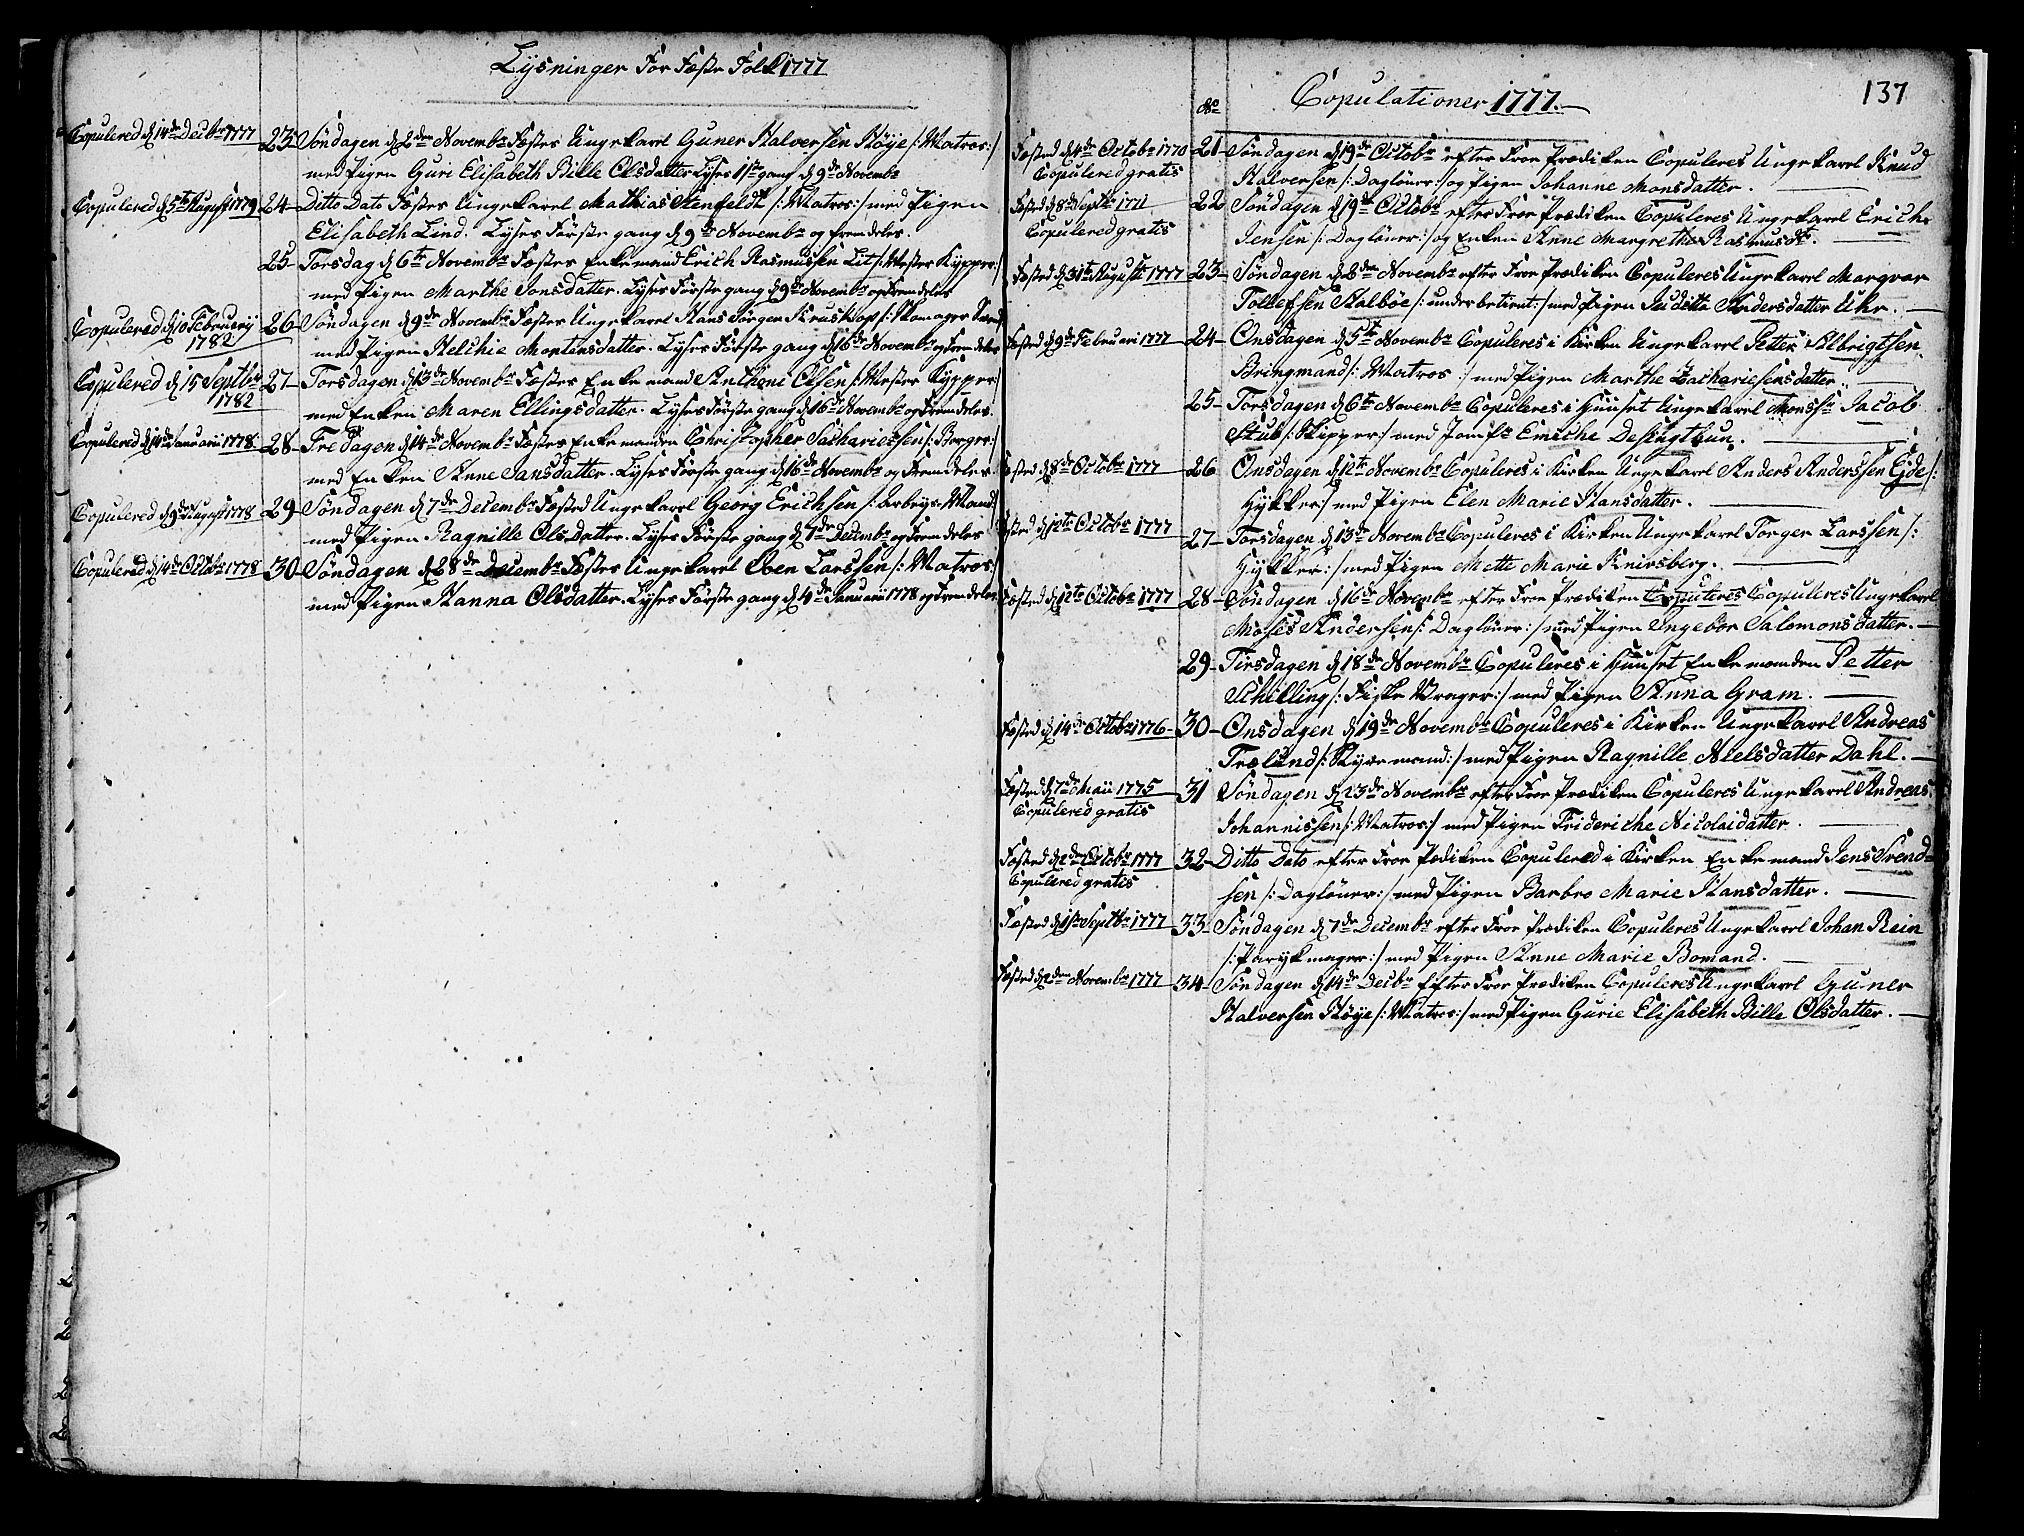 SAB, Nykirken Sokneprestembete, H/Haa: Ministerialbok nr. A 7, 1719-1781, s. 137